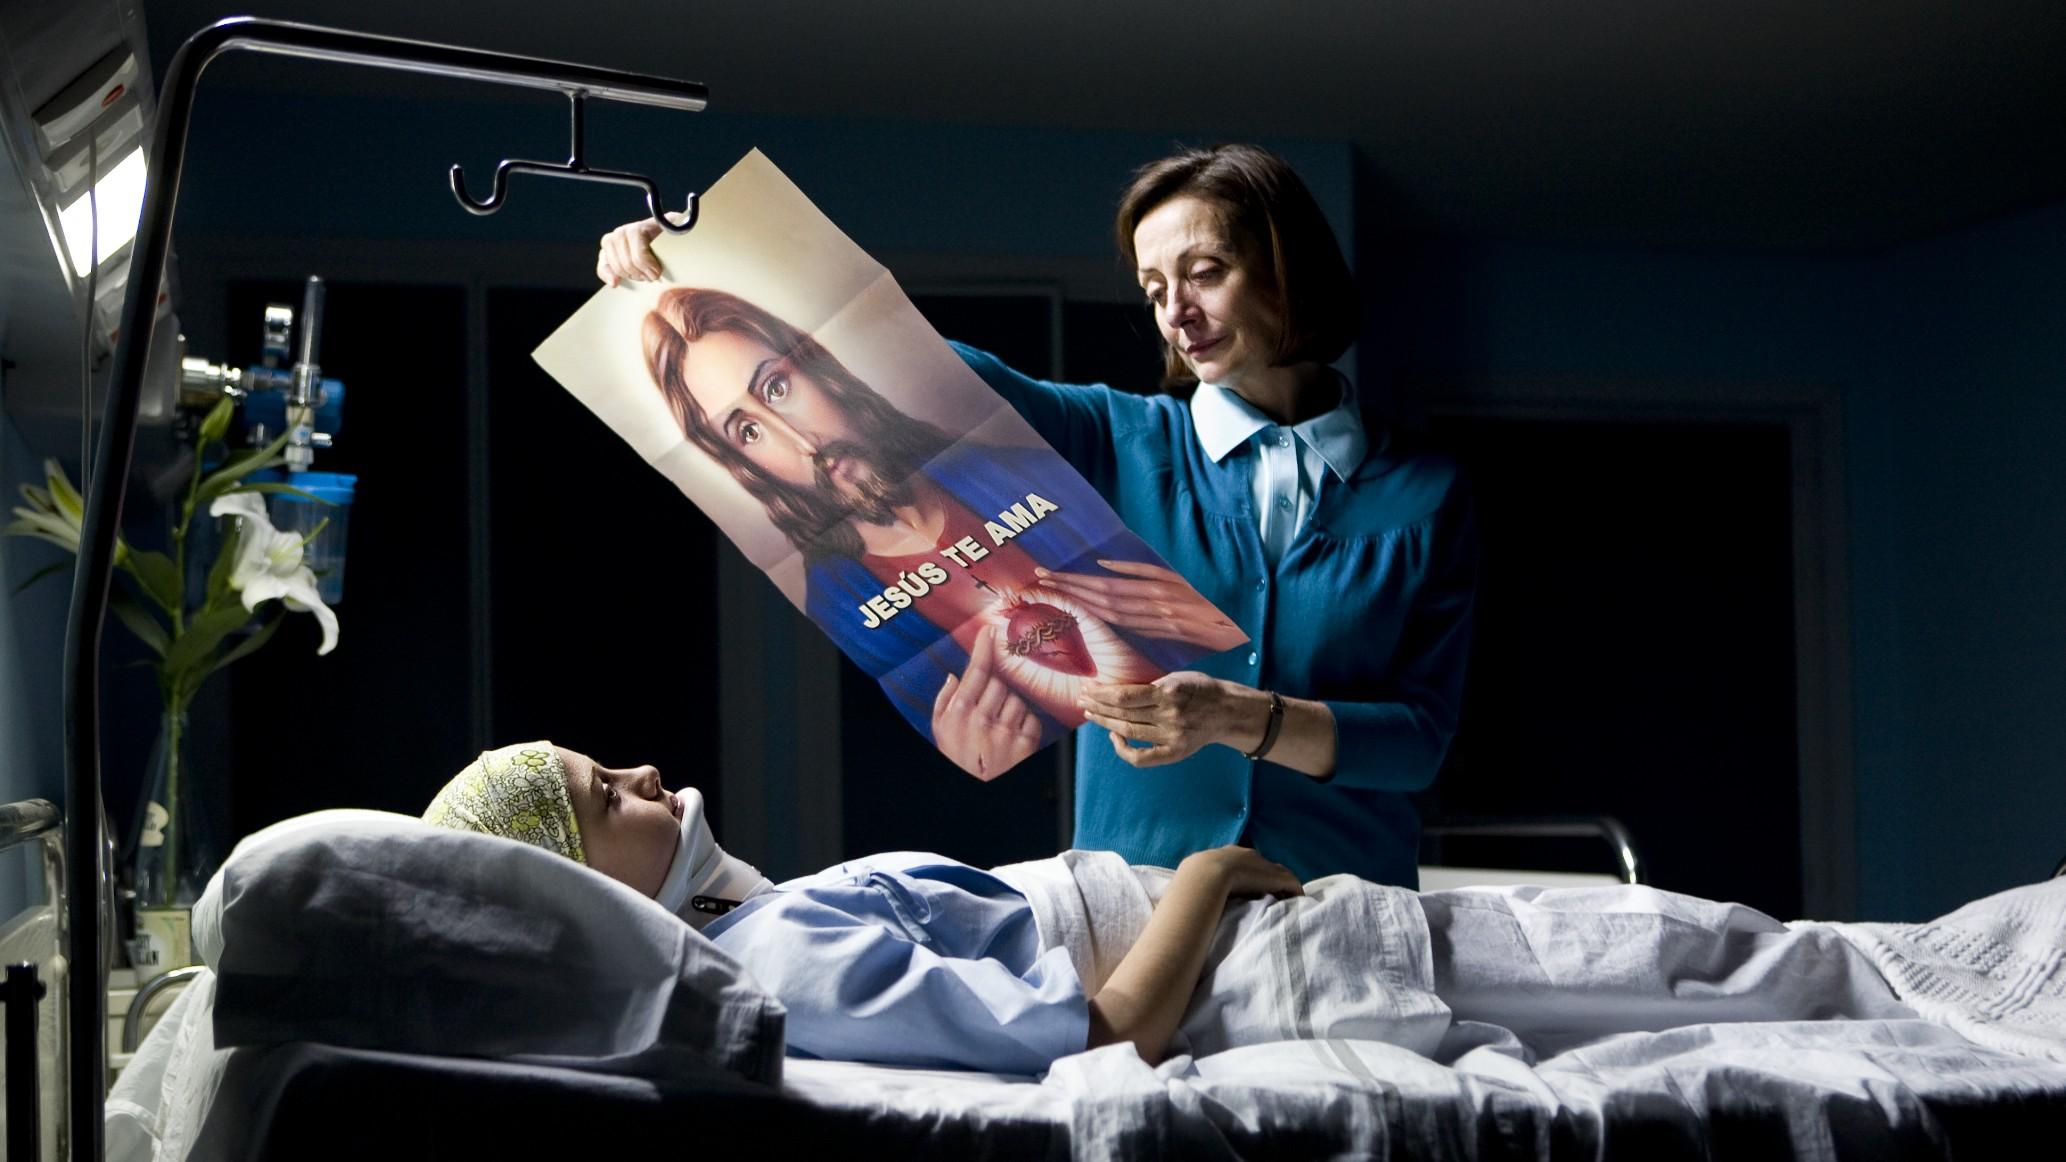 Photo. GONZAGA MANSO jesus te ama.jpg